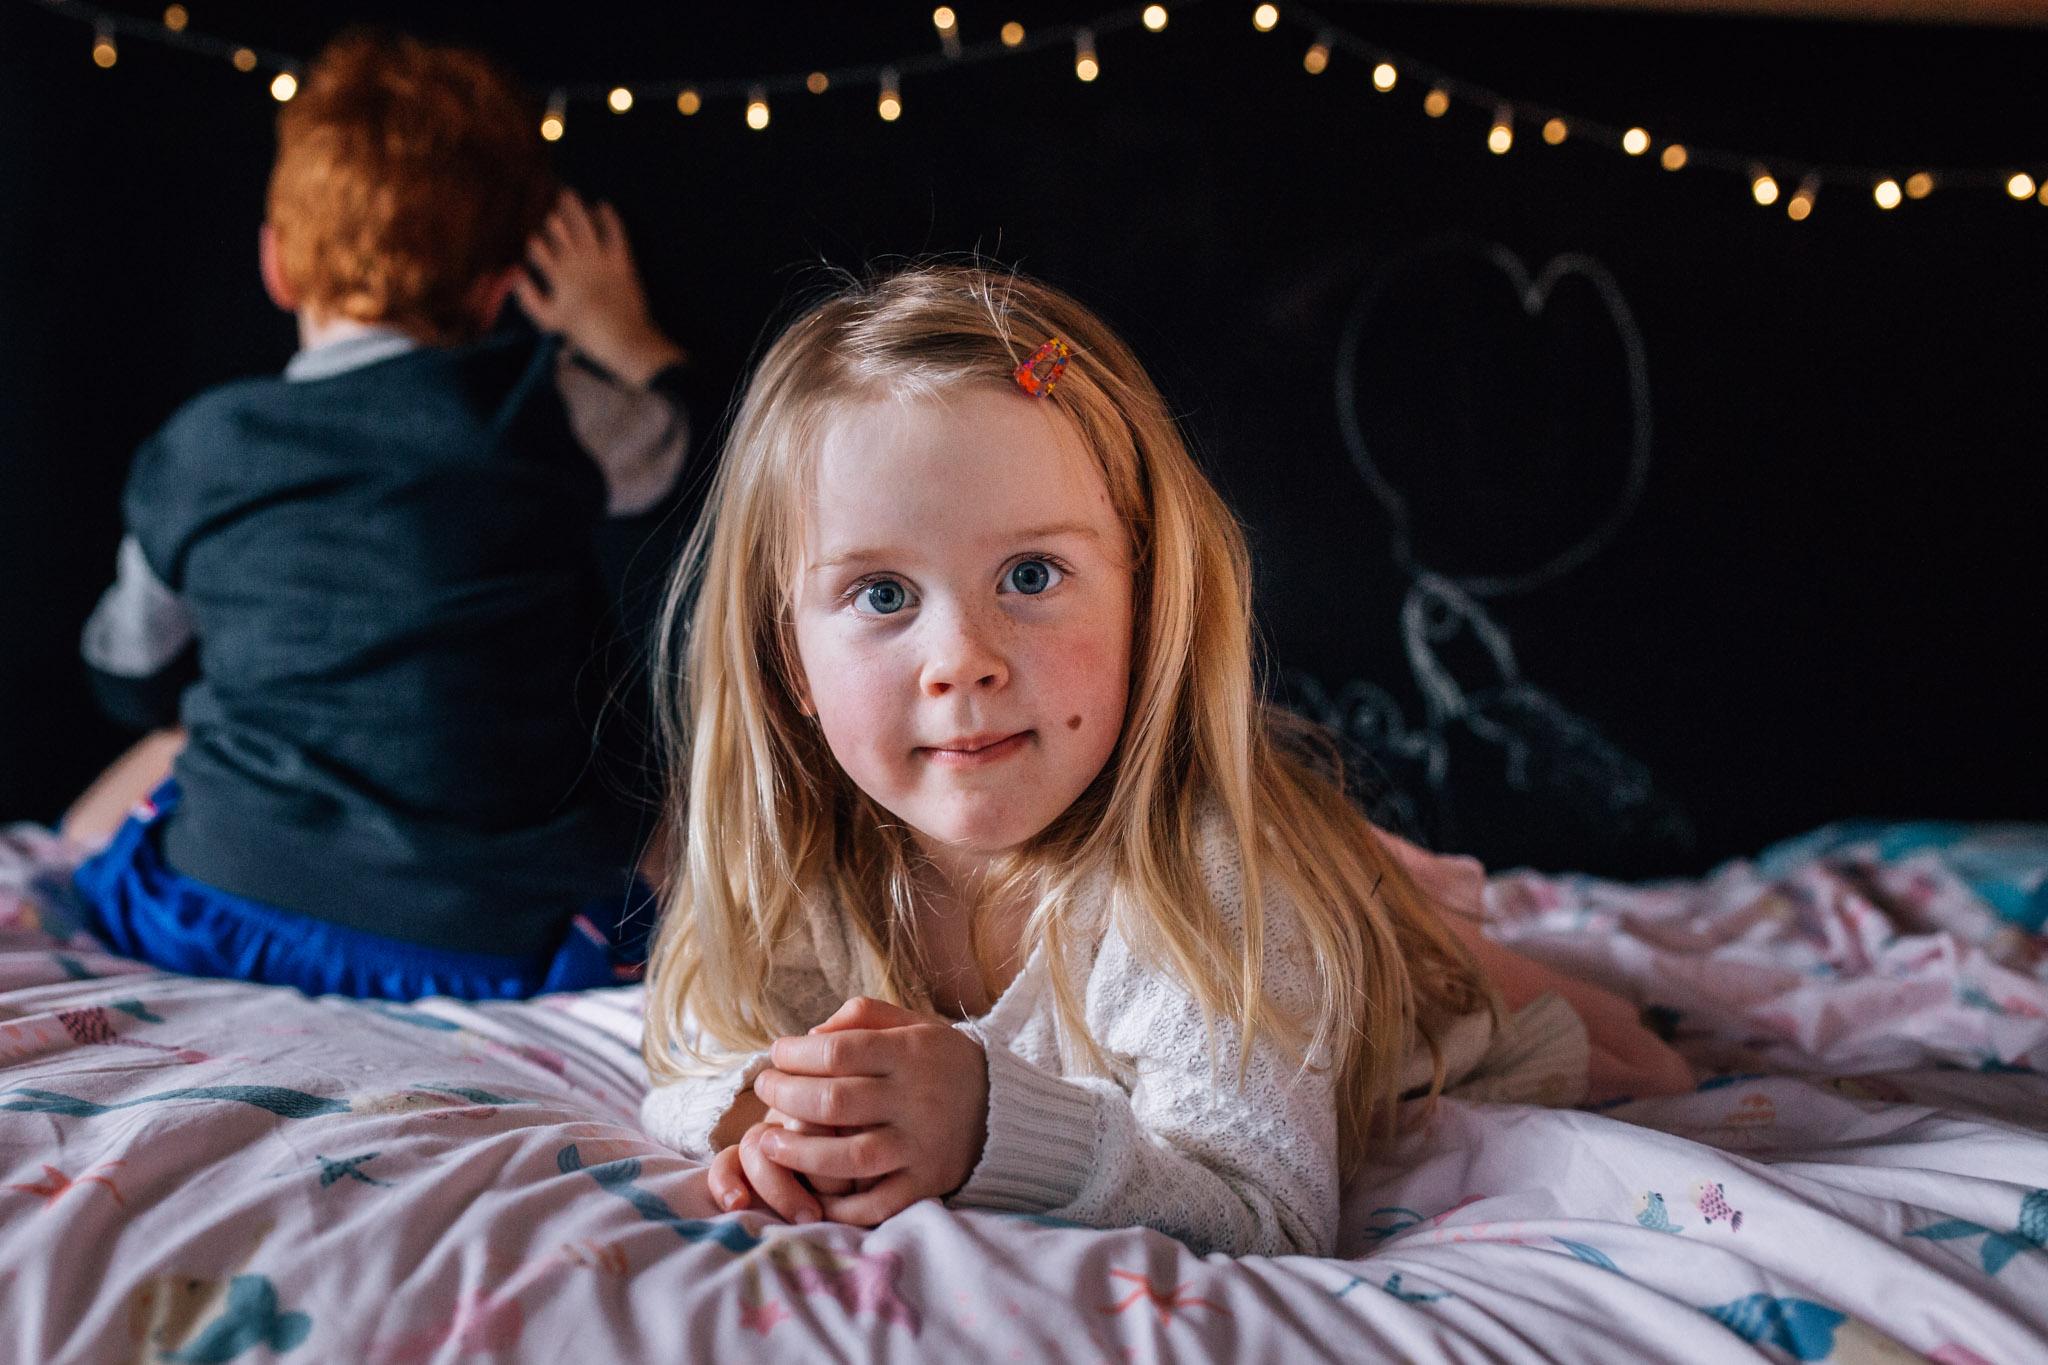 Little girl on her bed.